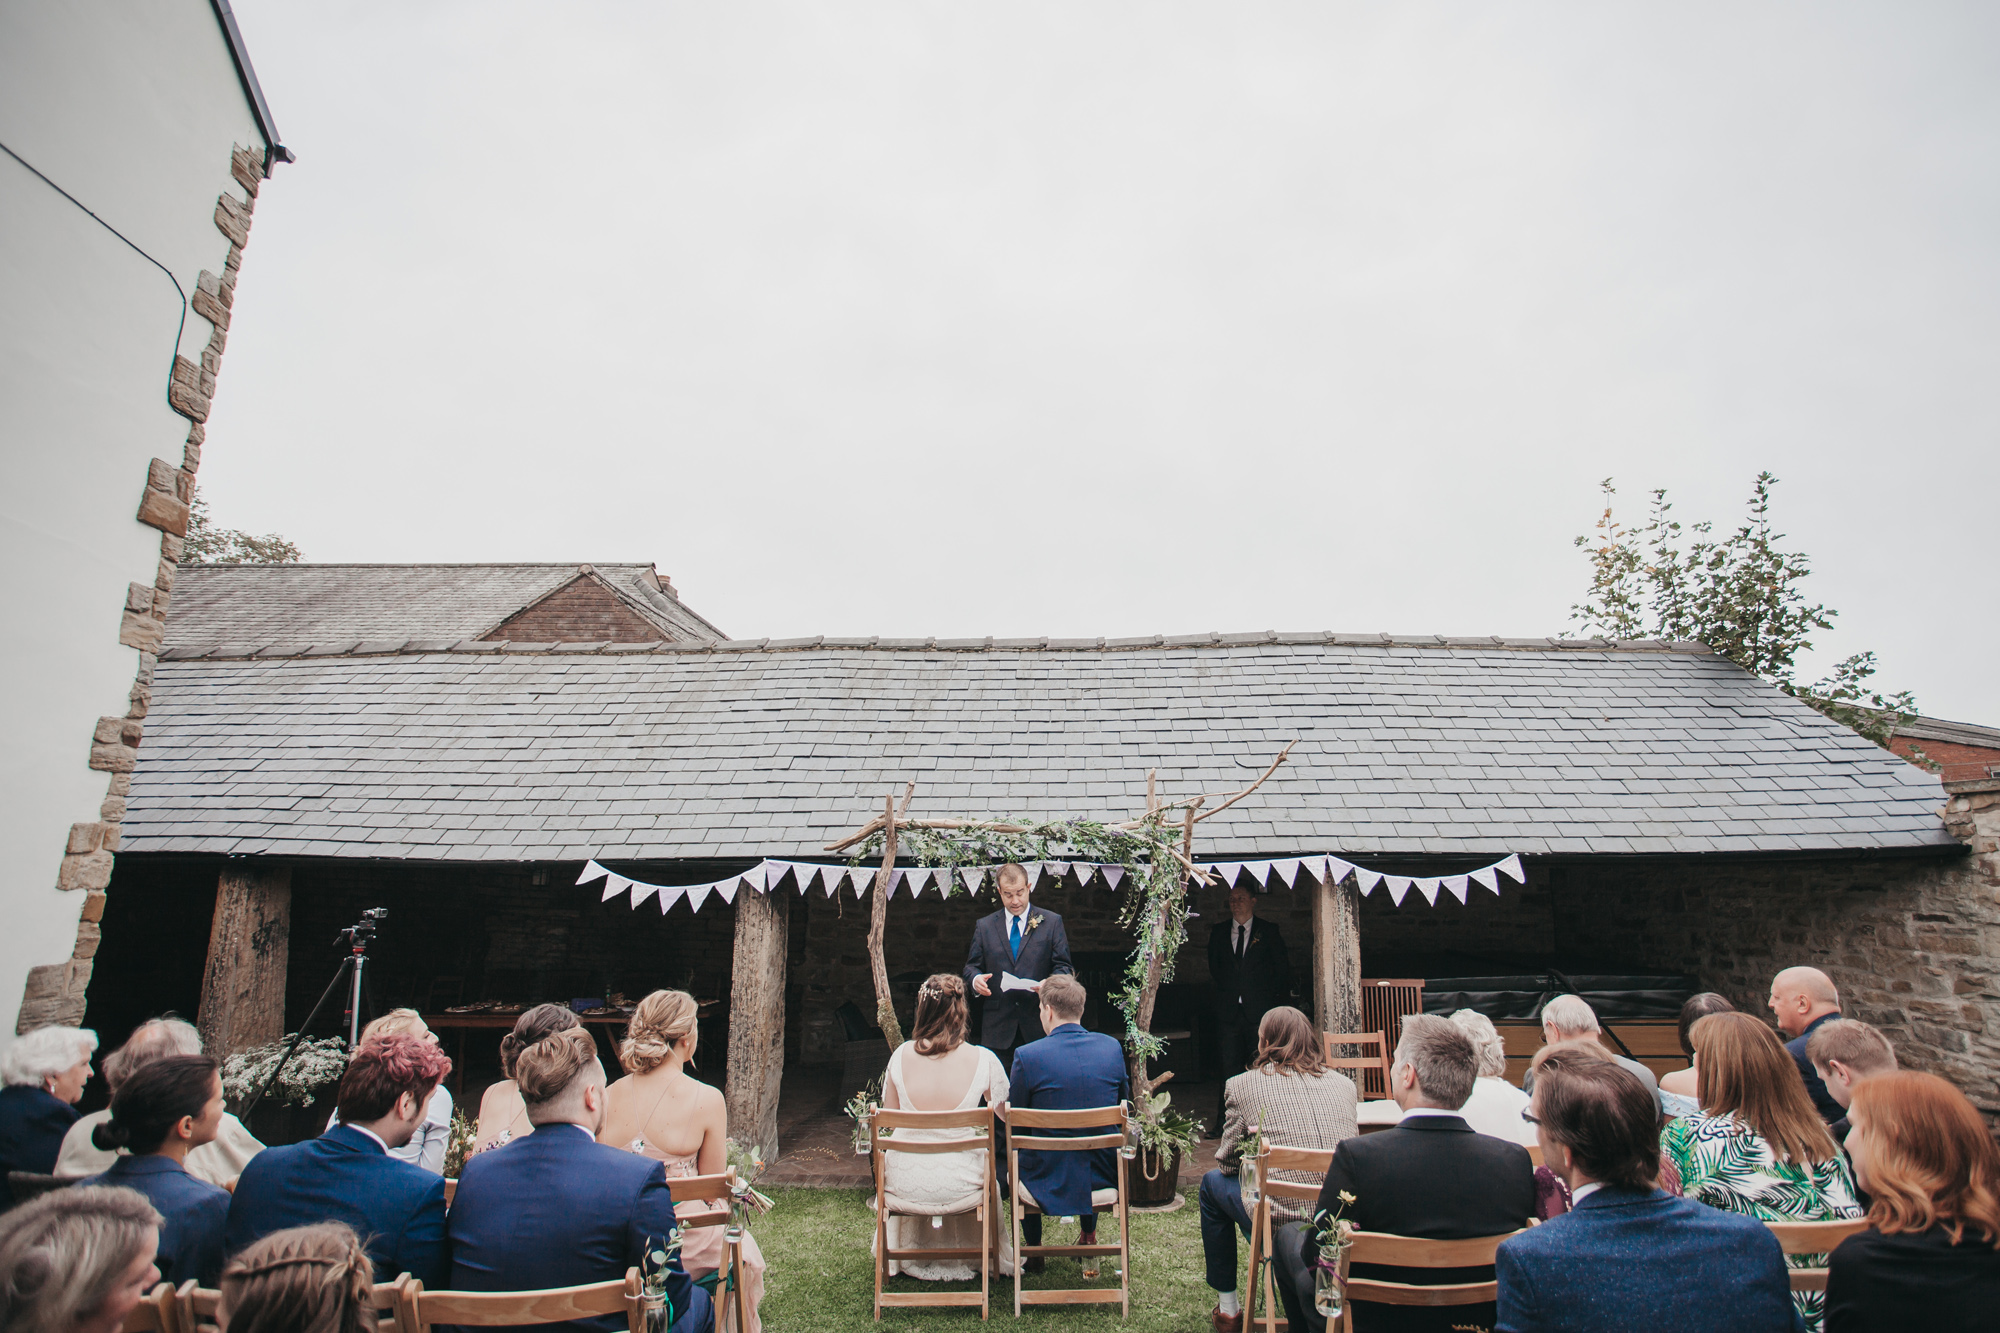 Kristy-Back-Garden-Outdoor-Wedding-Sheffield-Industrial-Warehouse-Wedding-Bohemian-Kate-Beaumont-Dahlia-Dress-10.jpg